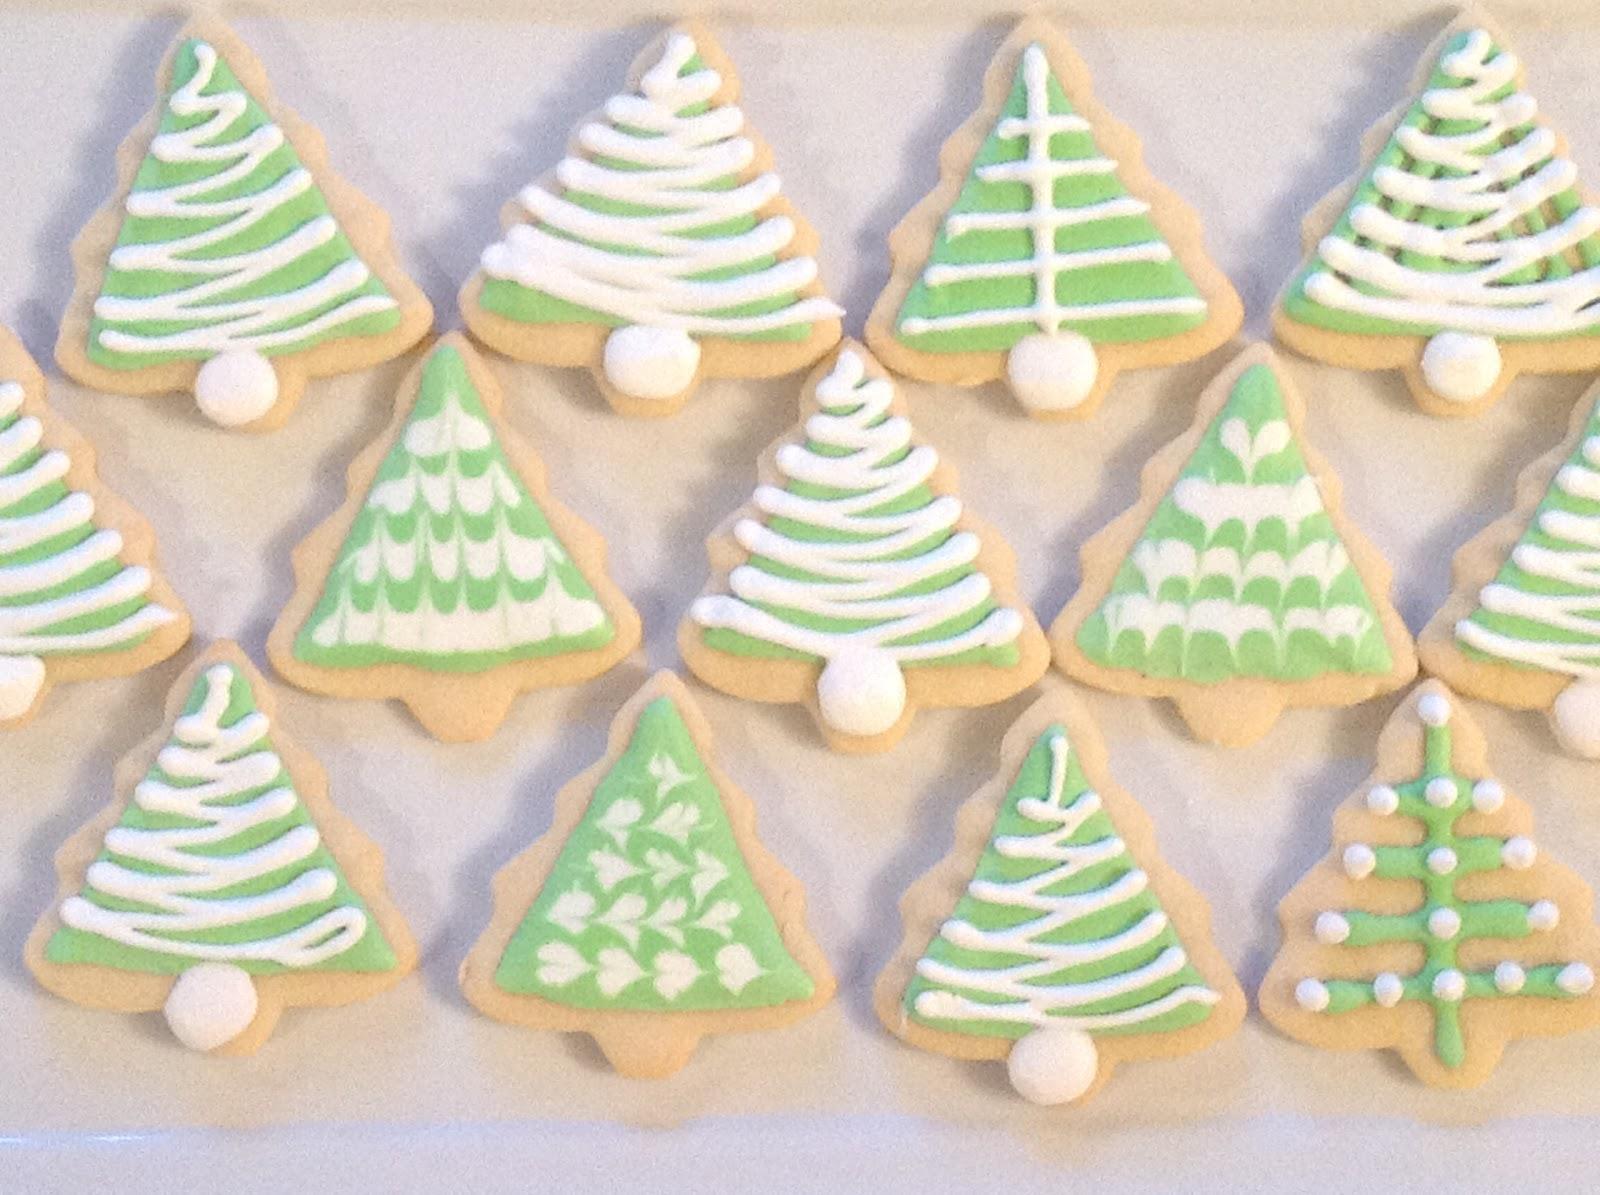 Dawn S Recipes Vanilla Almond Sugar Cookies With Royal Icing